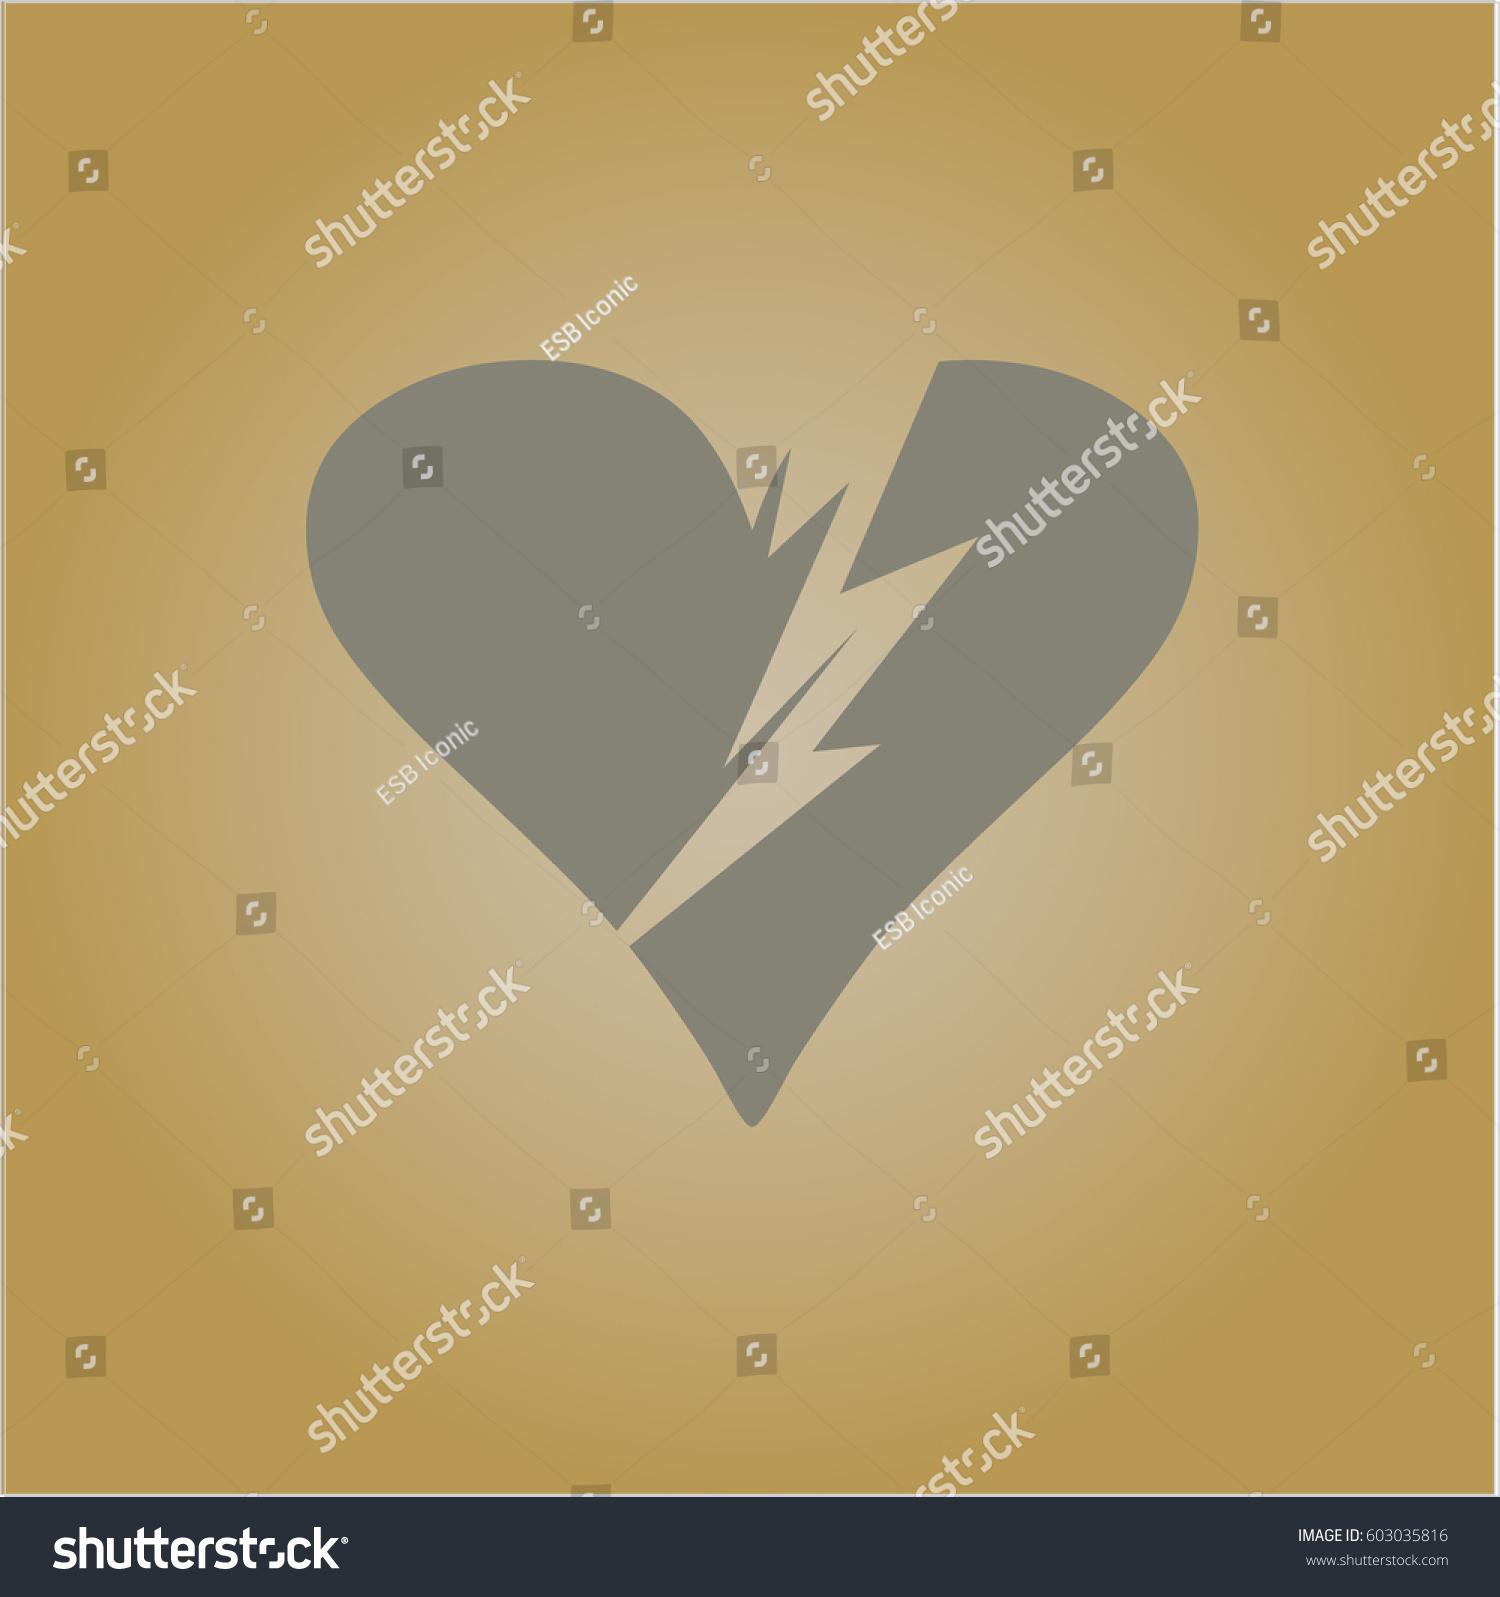 Vector illustration broken heart symbol stock vector 603035816 vector illustration of broken heart symbol buycottarizona